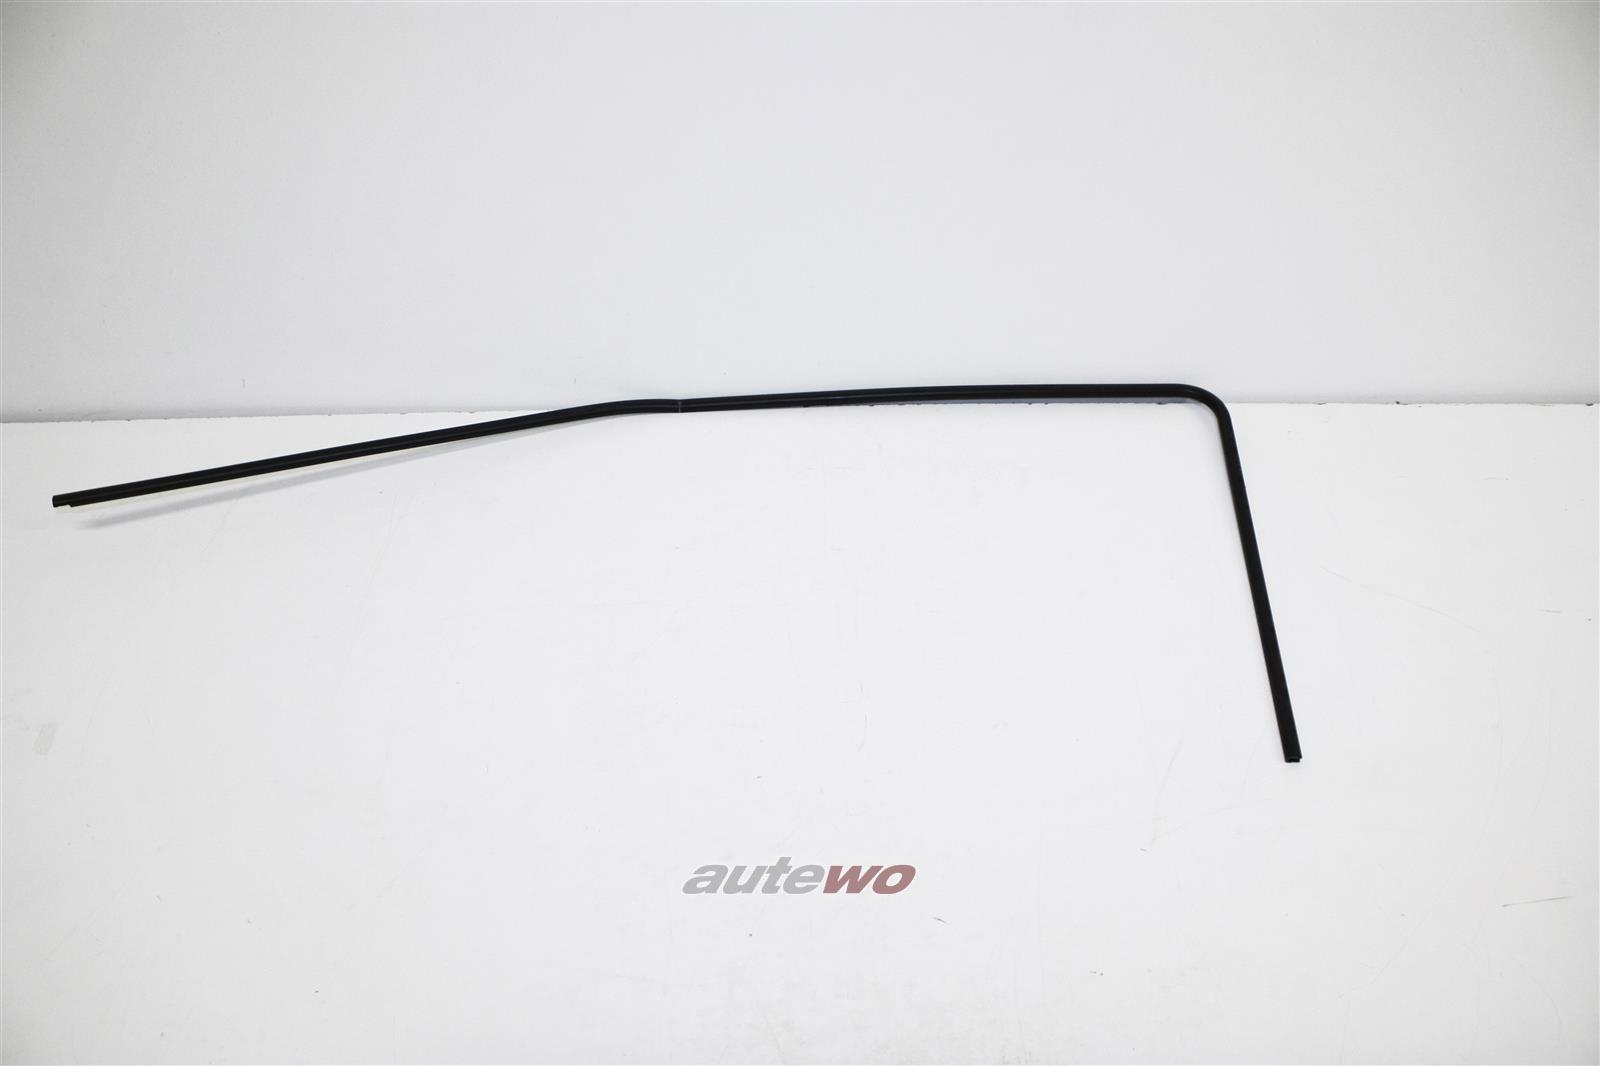 855837438 NEU Audi Coupe/Urquattro 81/85 Coupe Kantenschutz Fenster rechts negro